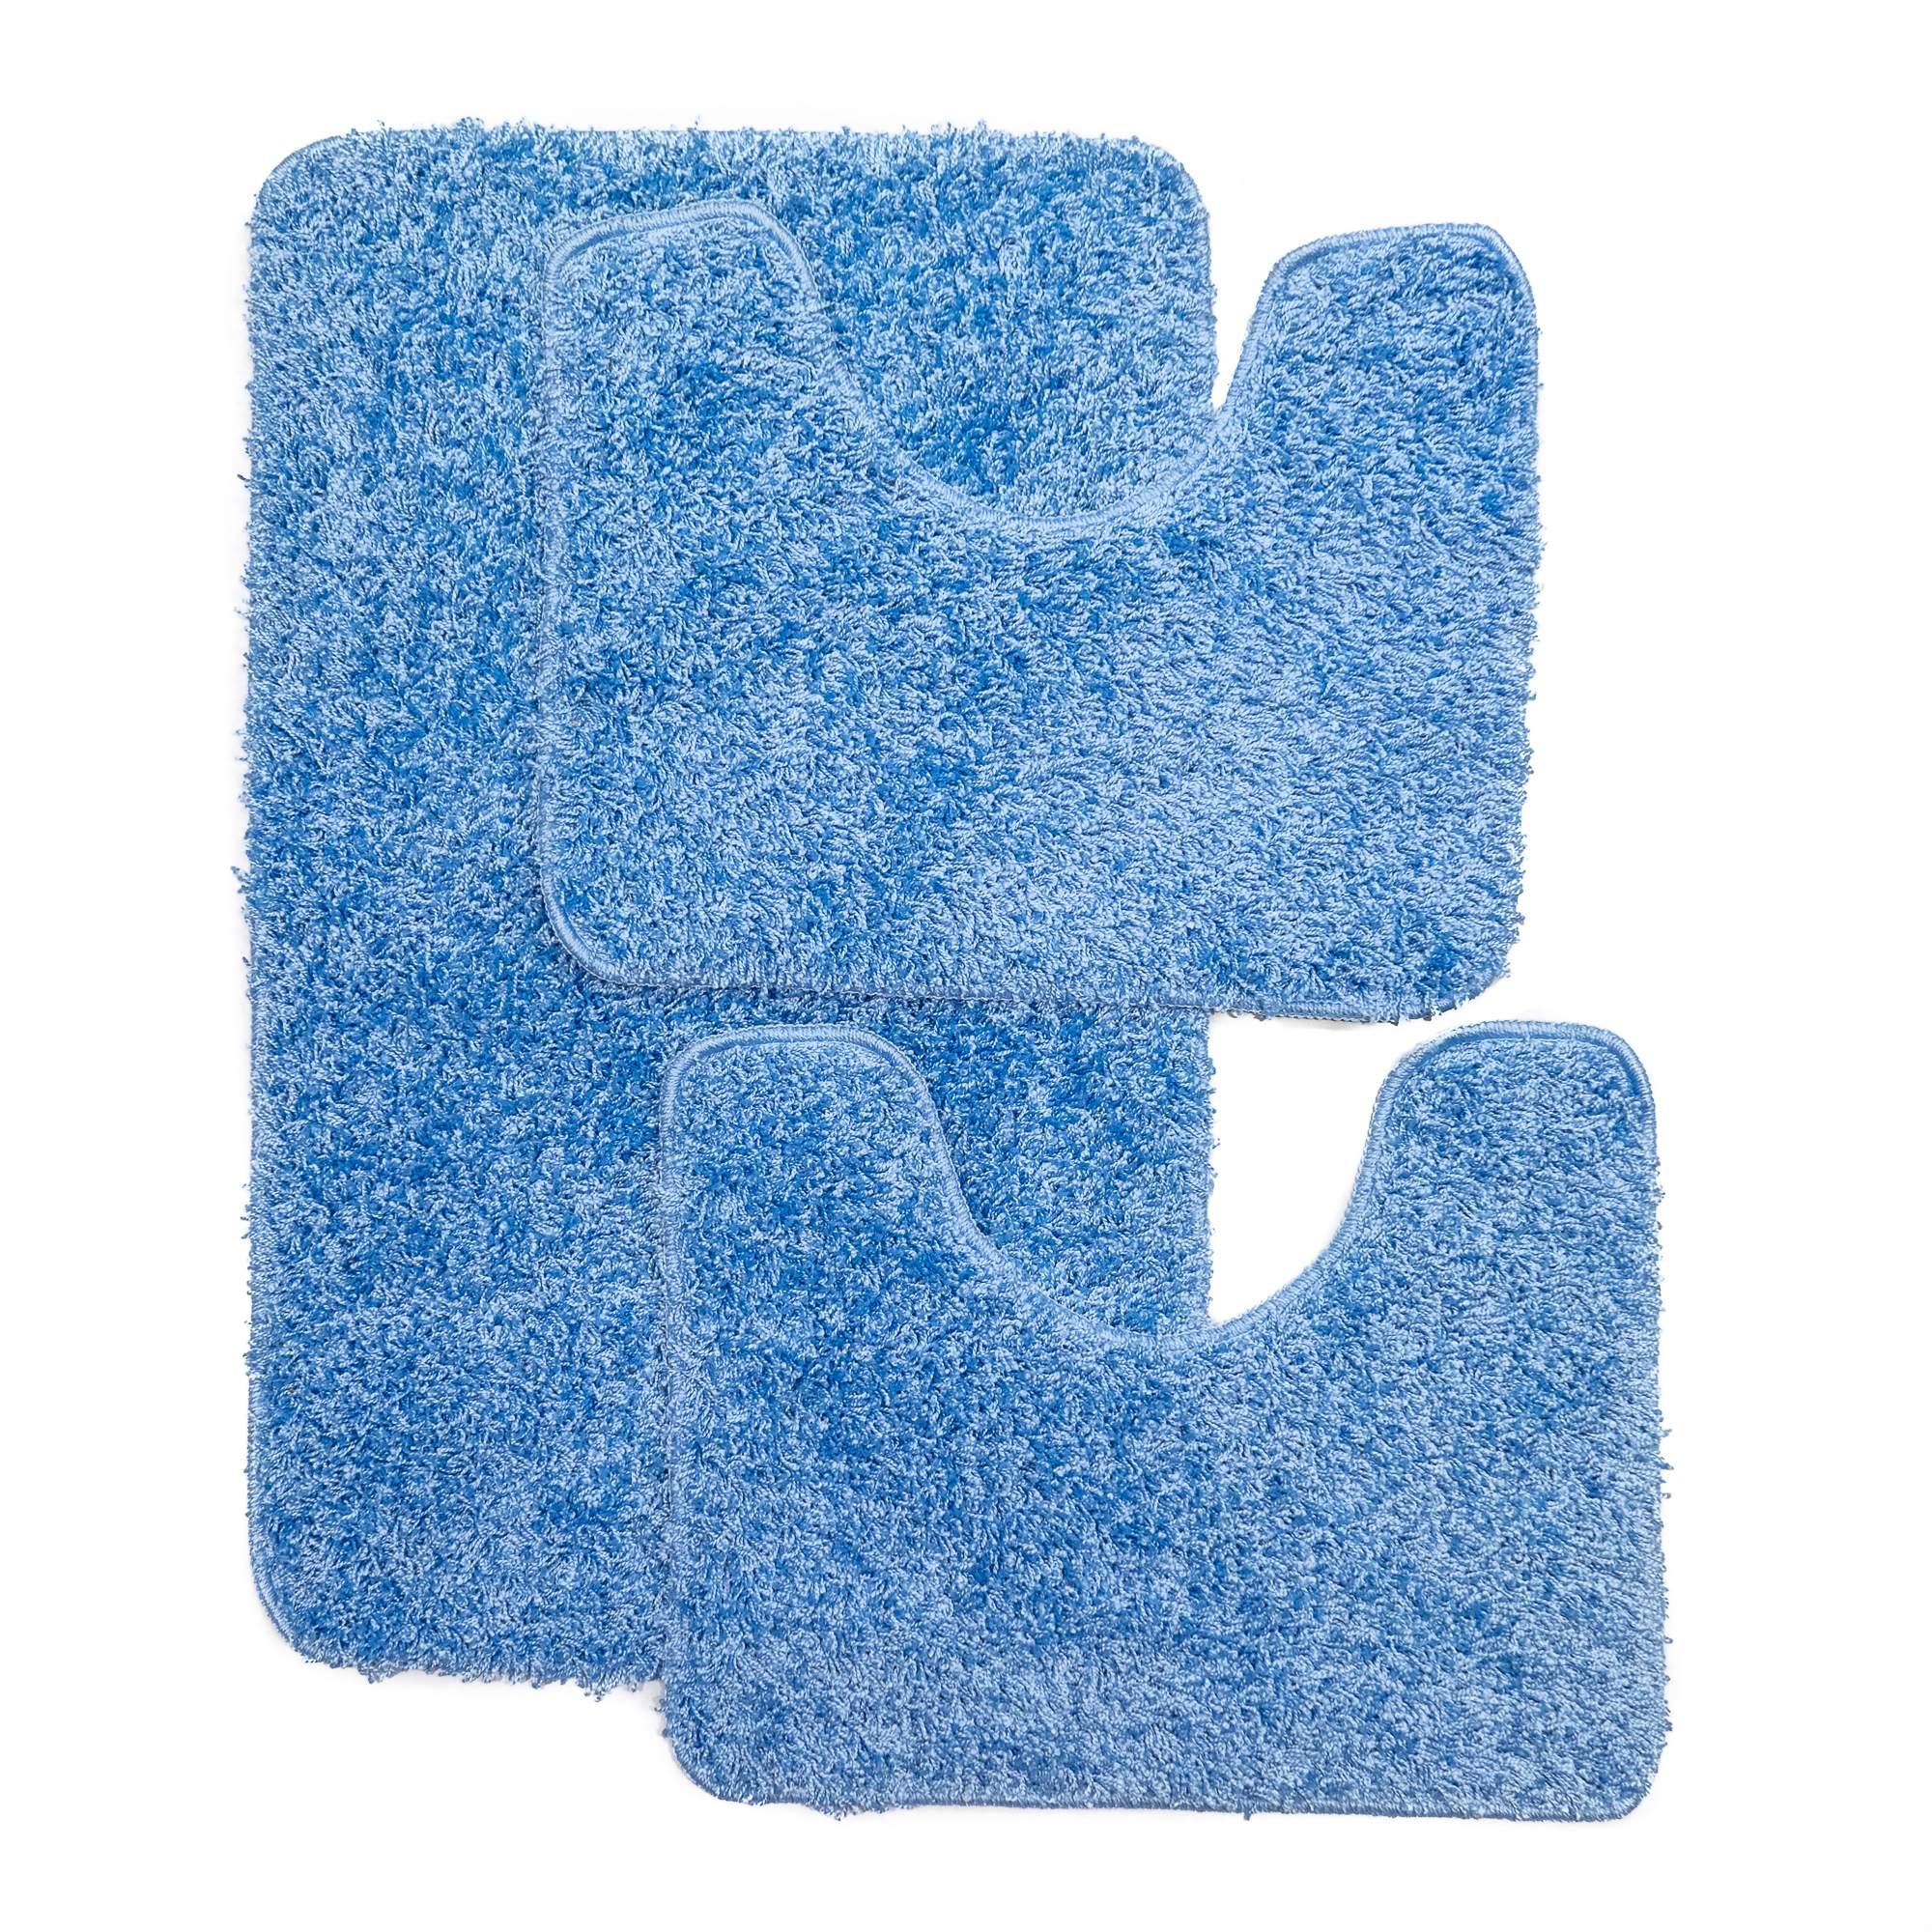 Tappeto SOFT PLAIN Blu Parure 3 pezzi